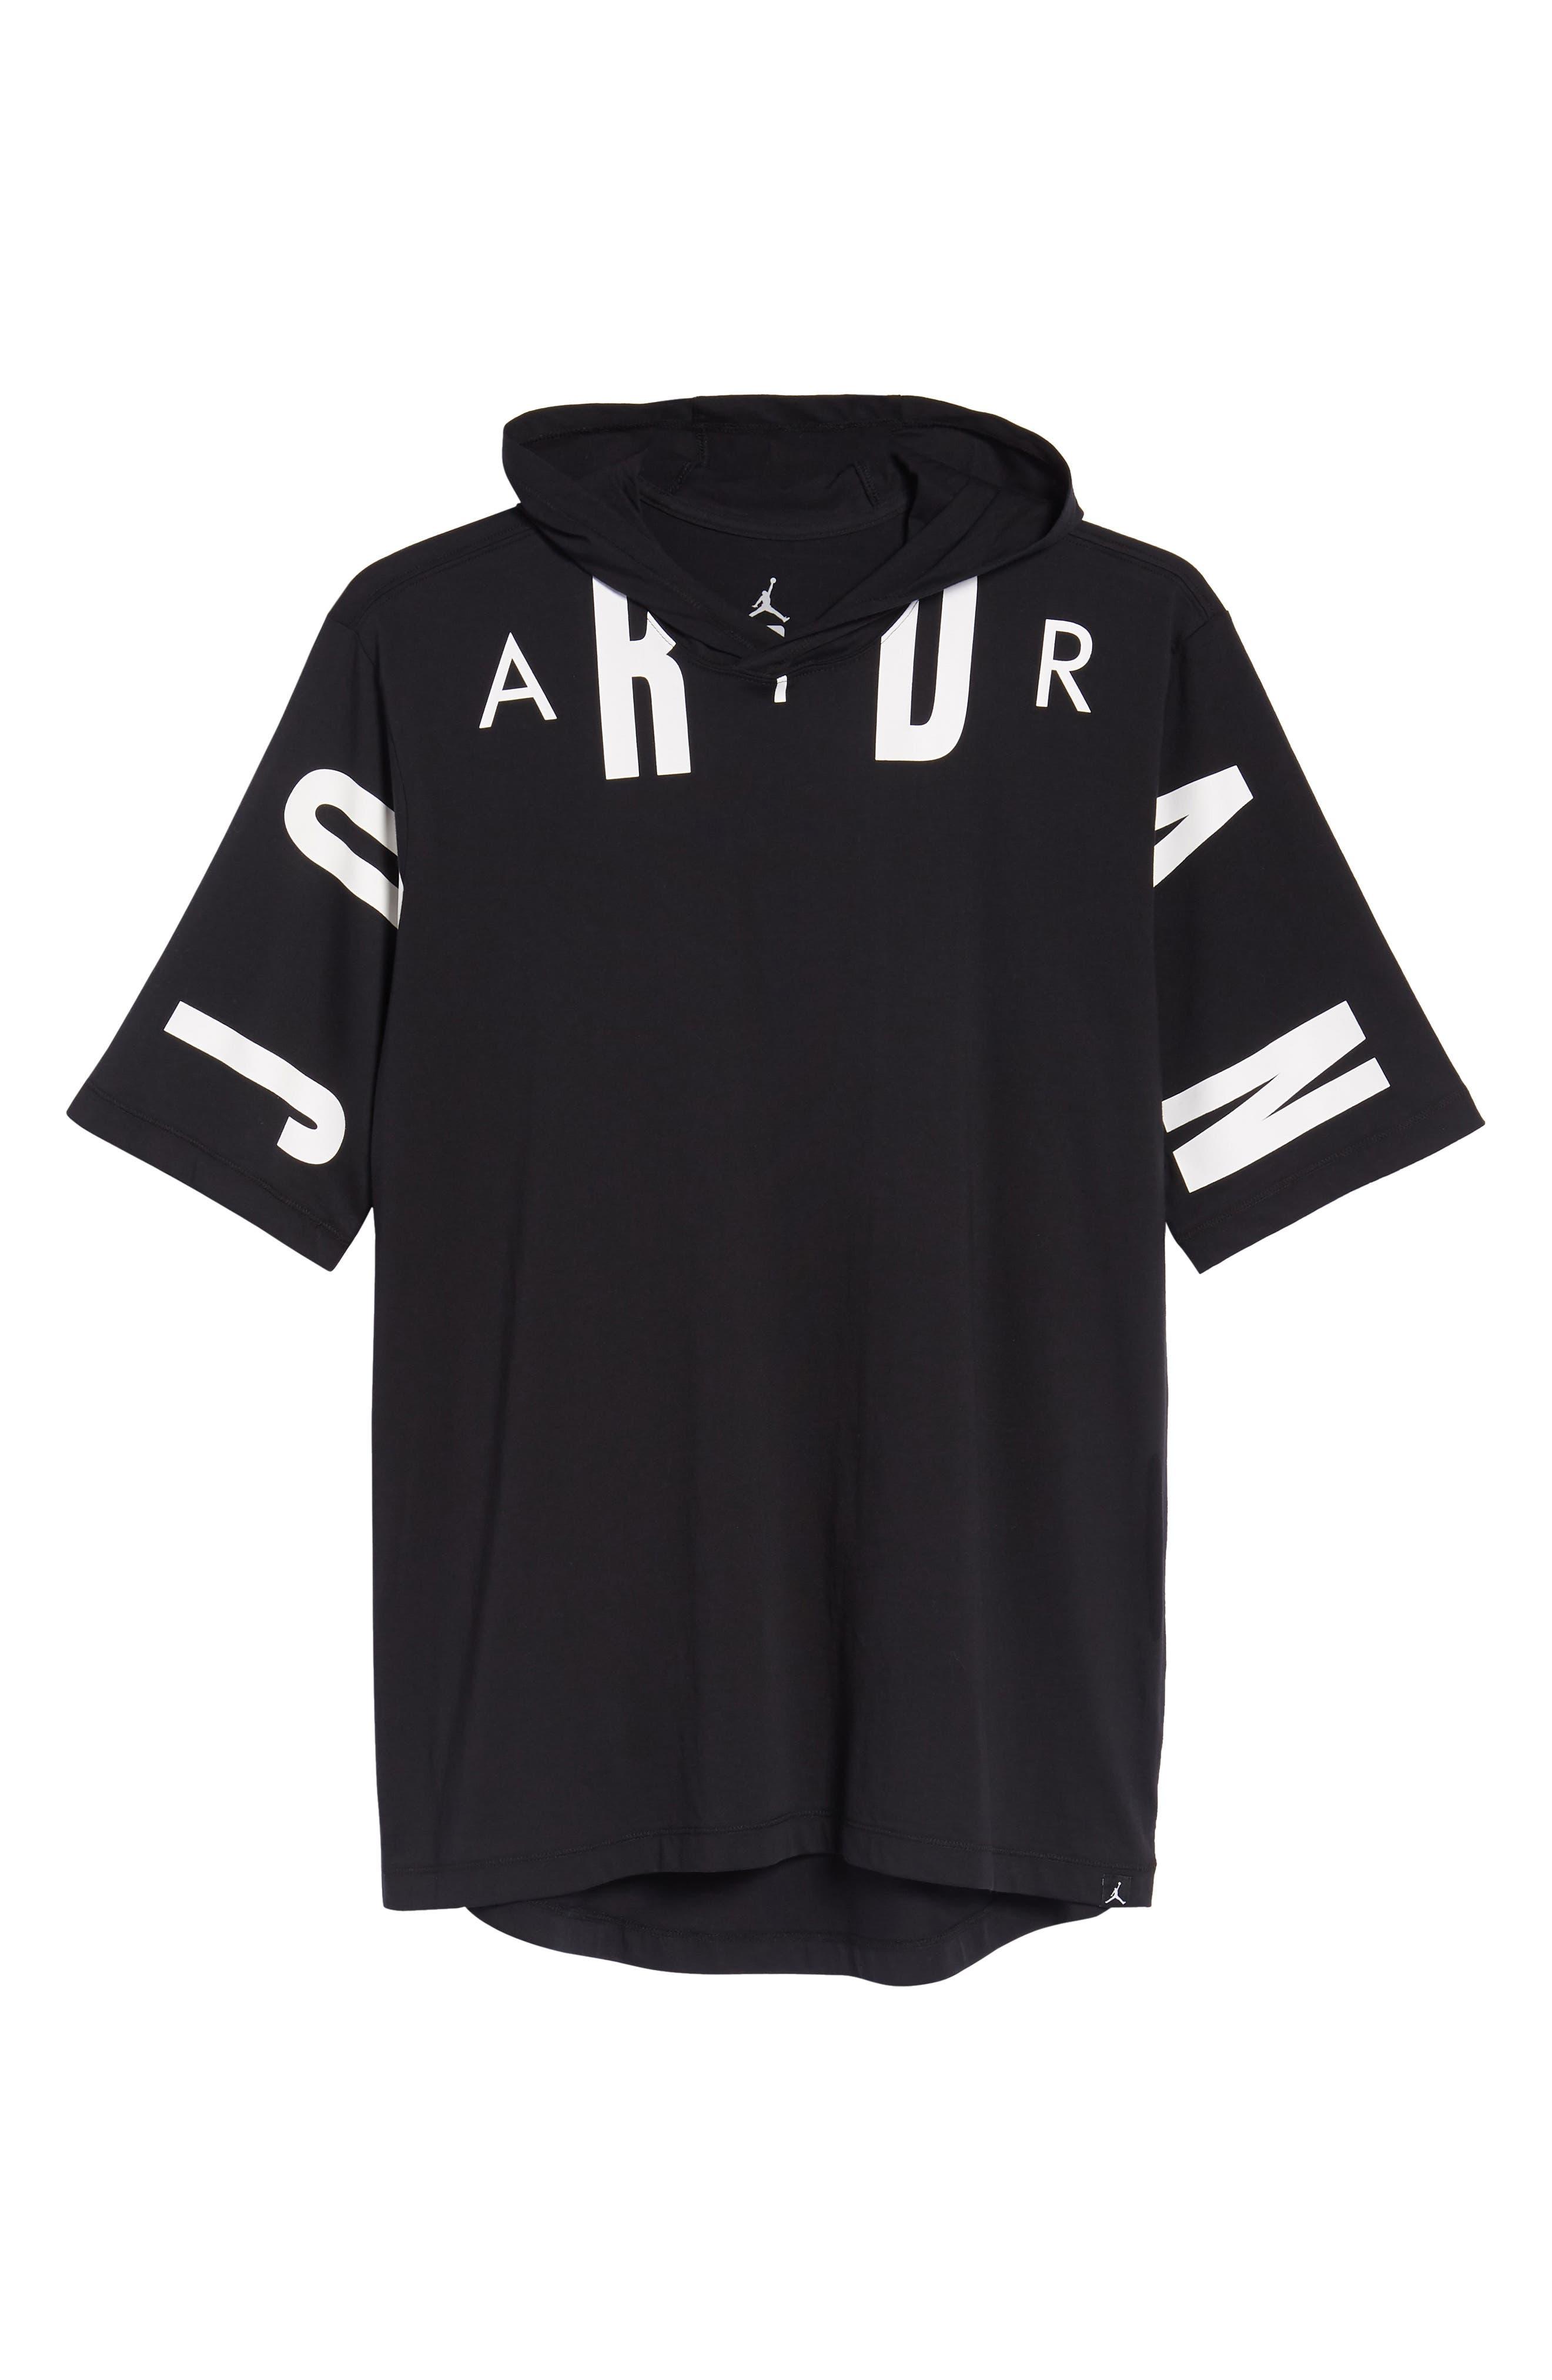 Jordan 23 Hooded T-Shirt,                             Alternate thumbnail 6, color,                             BLACK/ WHITE